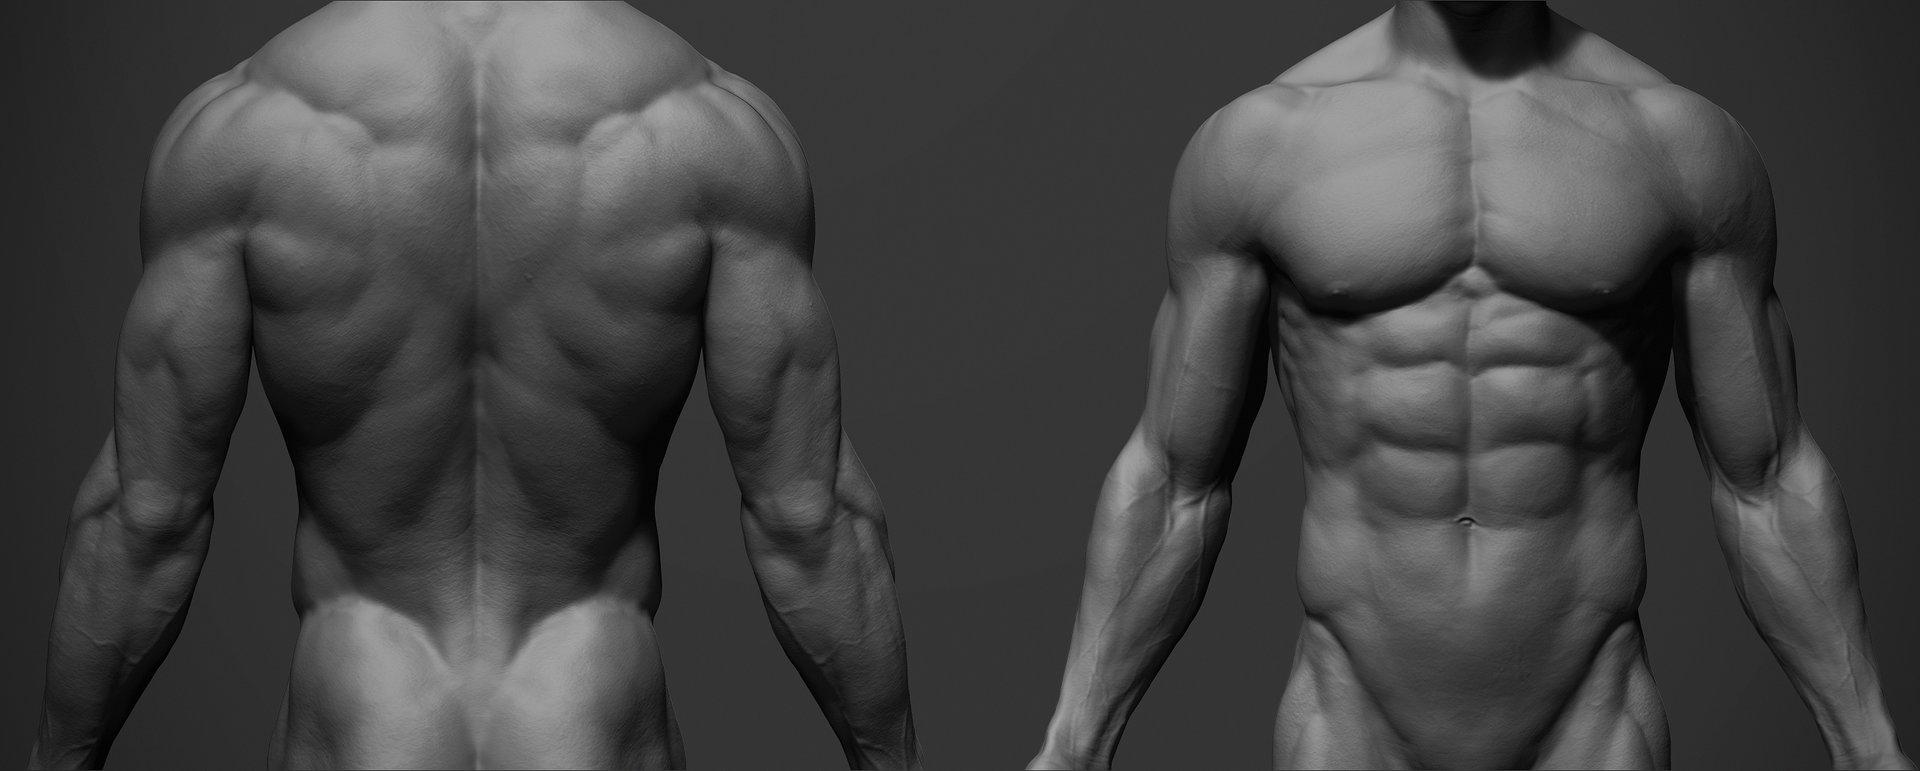 ArtStation - Male Anatomy Ref, adam skutt